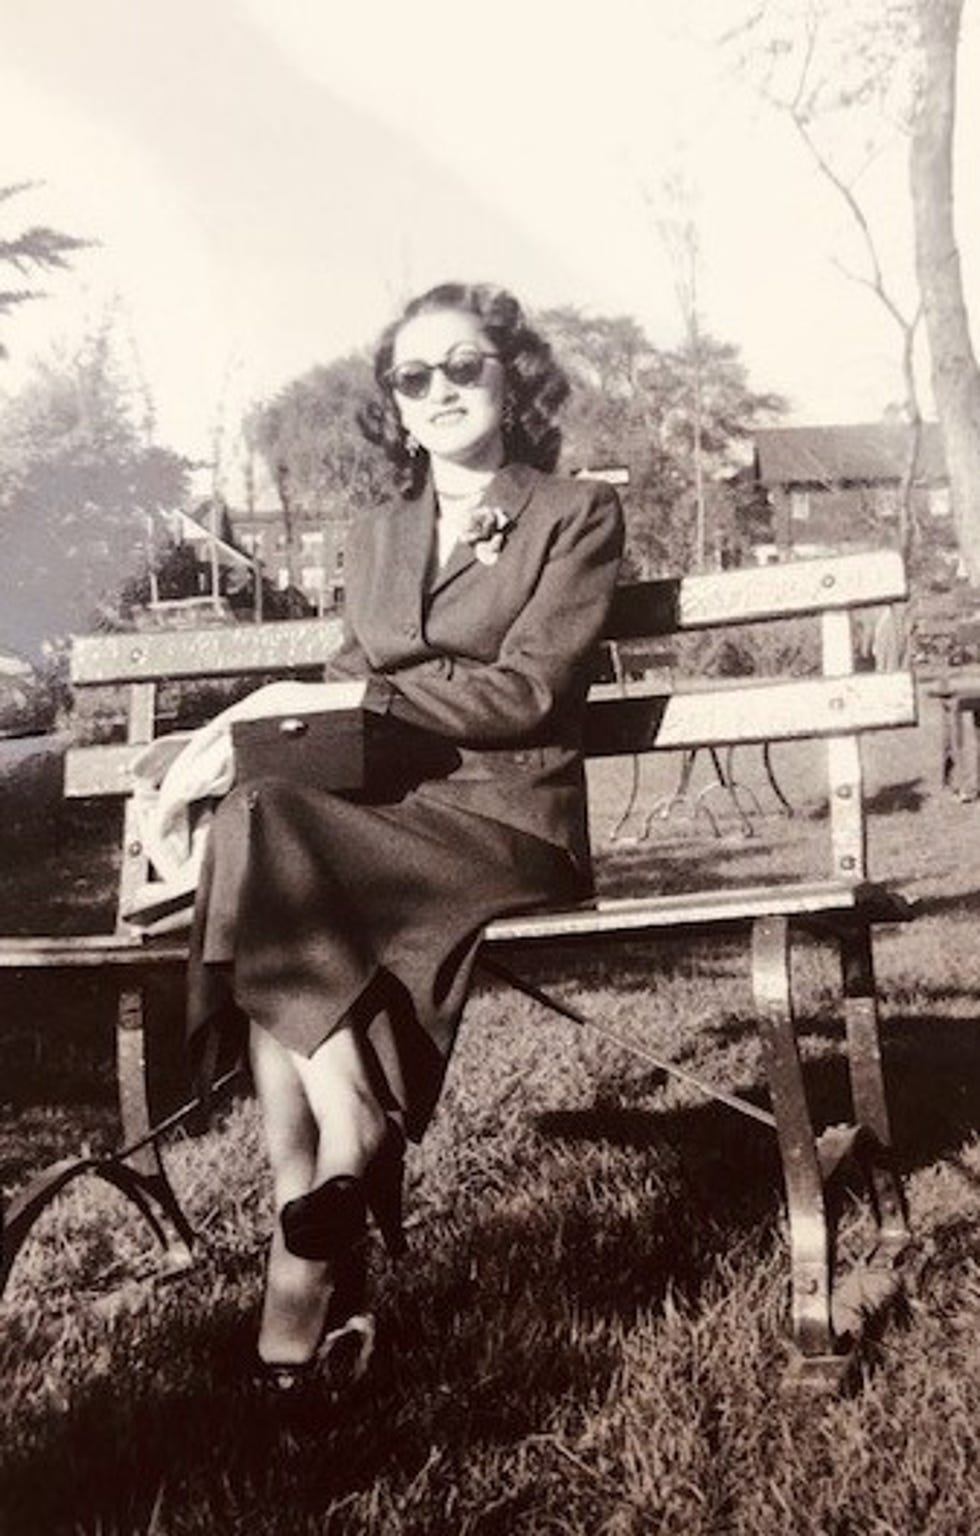 Sophie Klisman in Detroit during the 1950s.